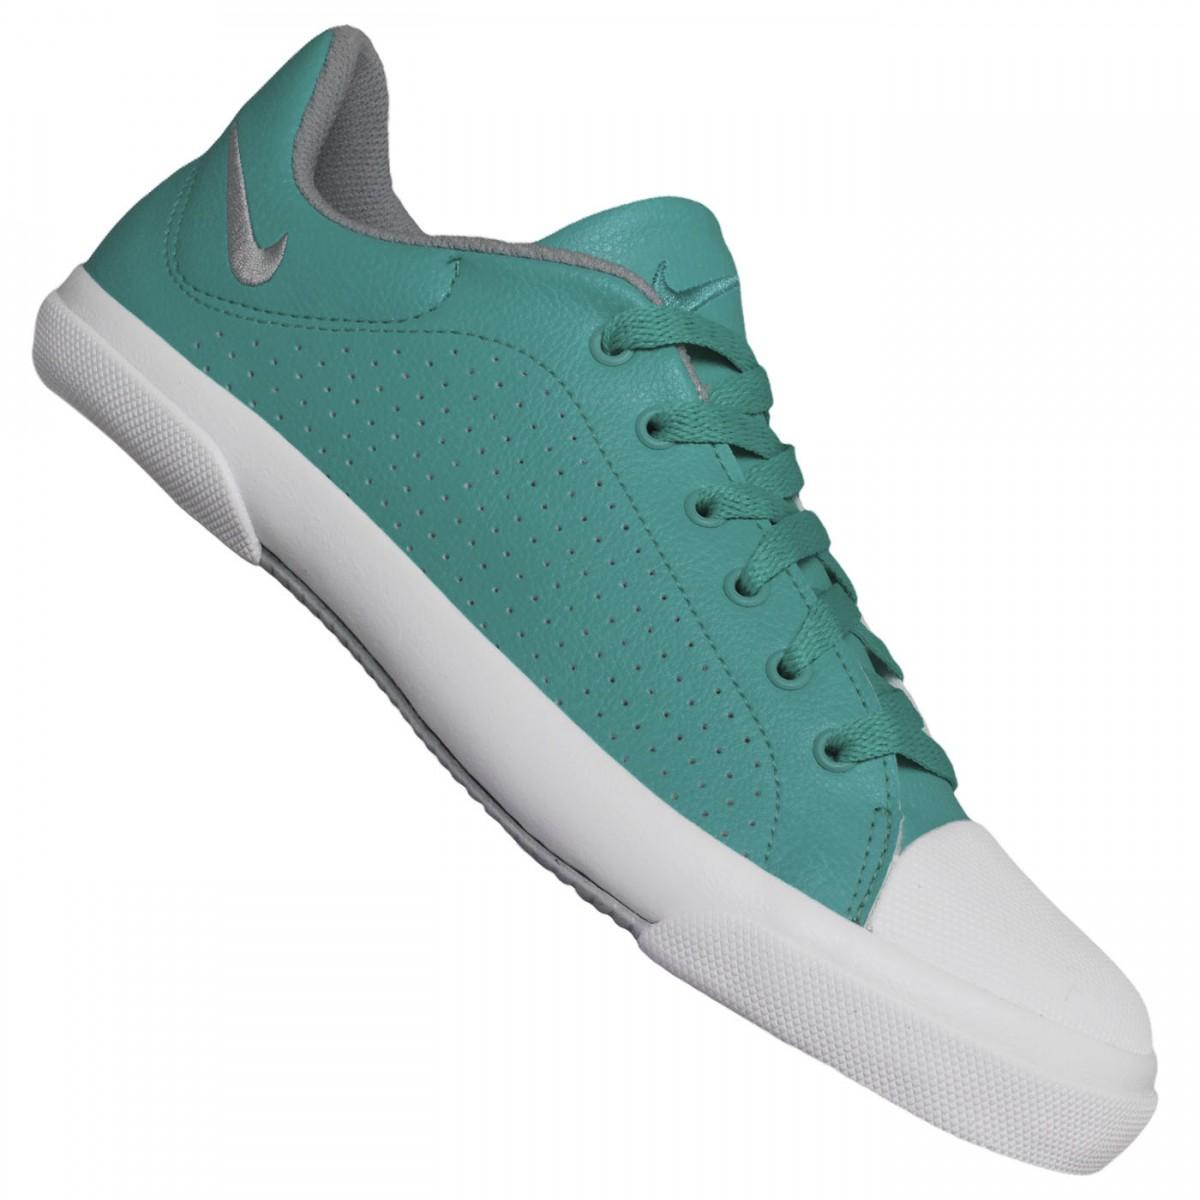 1e0865289f Tênis Nike Biscuit 2 SL - Feminino